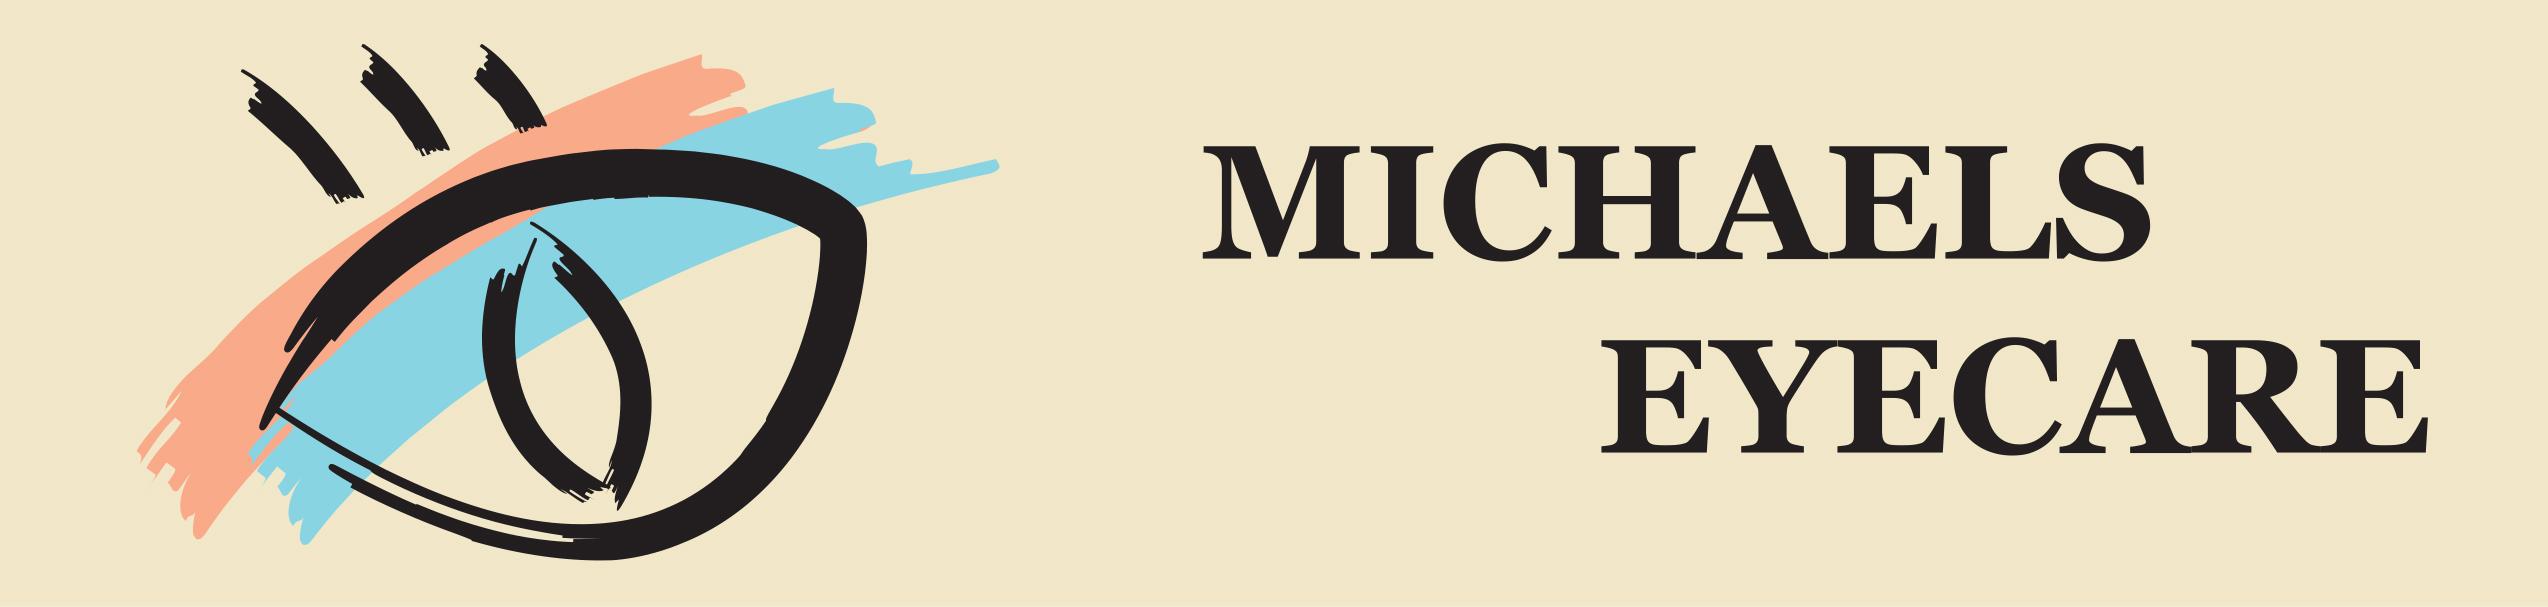 Michaels Eyecare